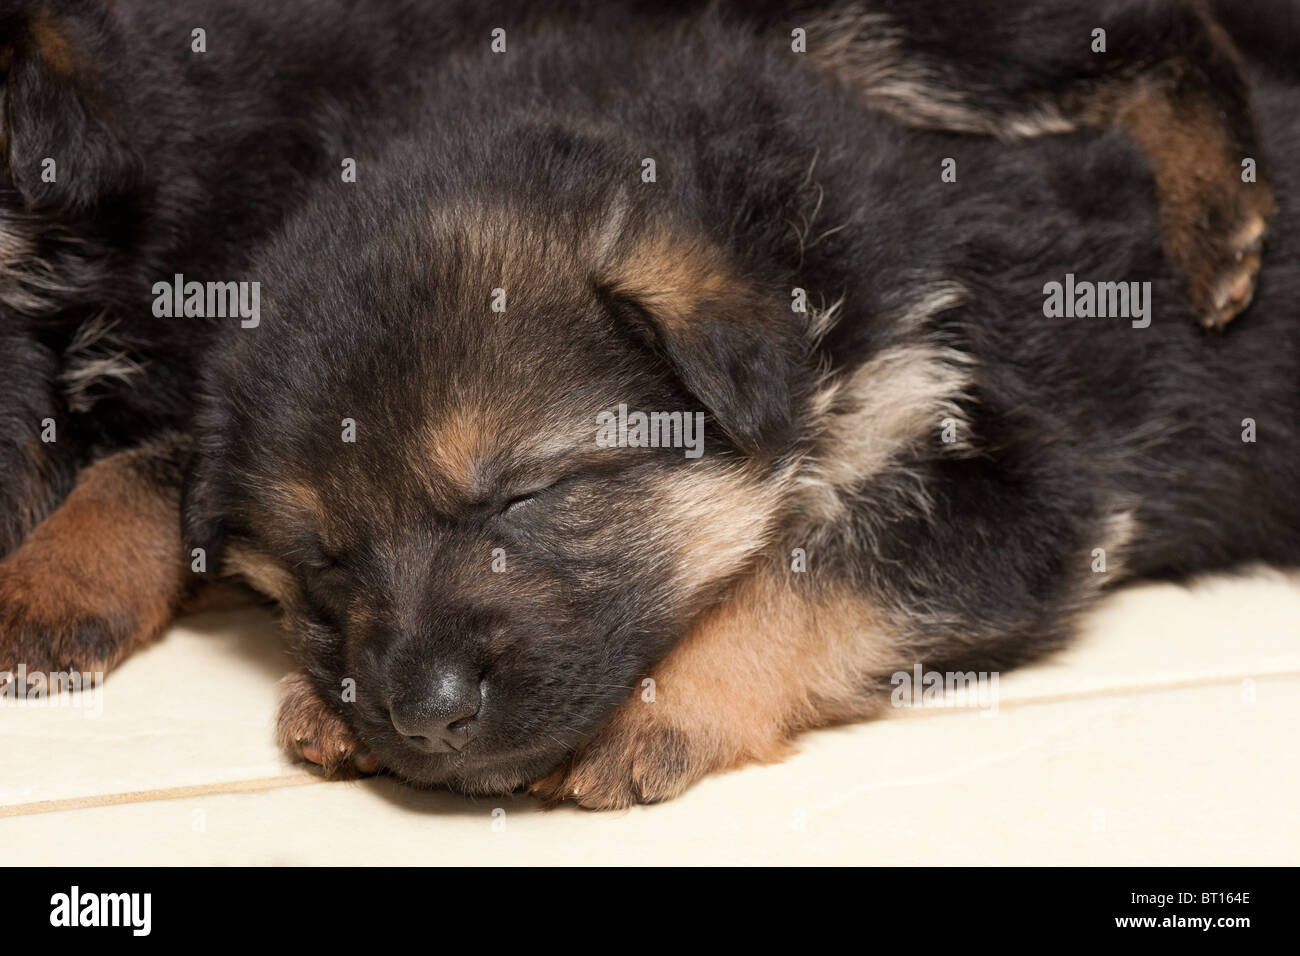 German Shepherd Dog puppies at four weeks old - Stock Image